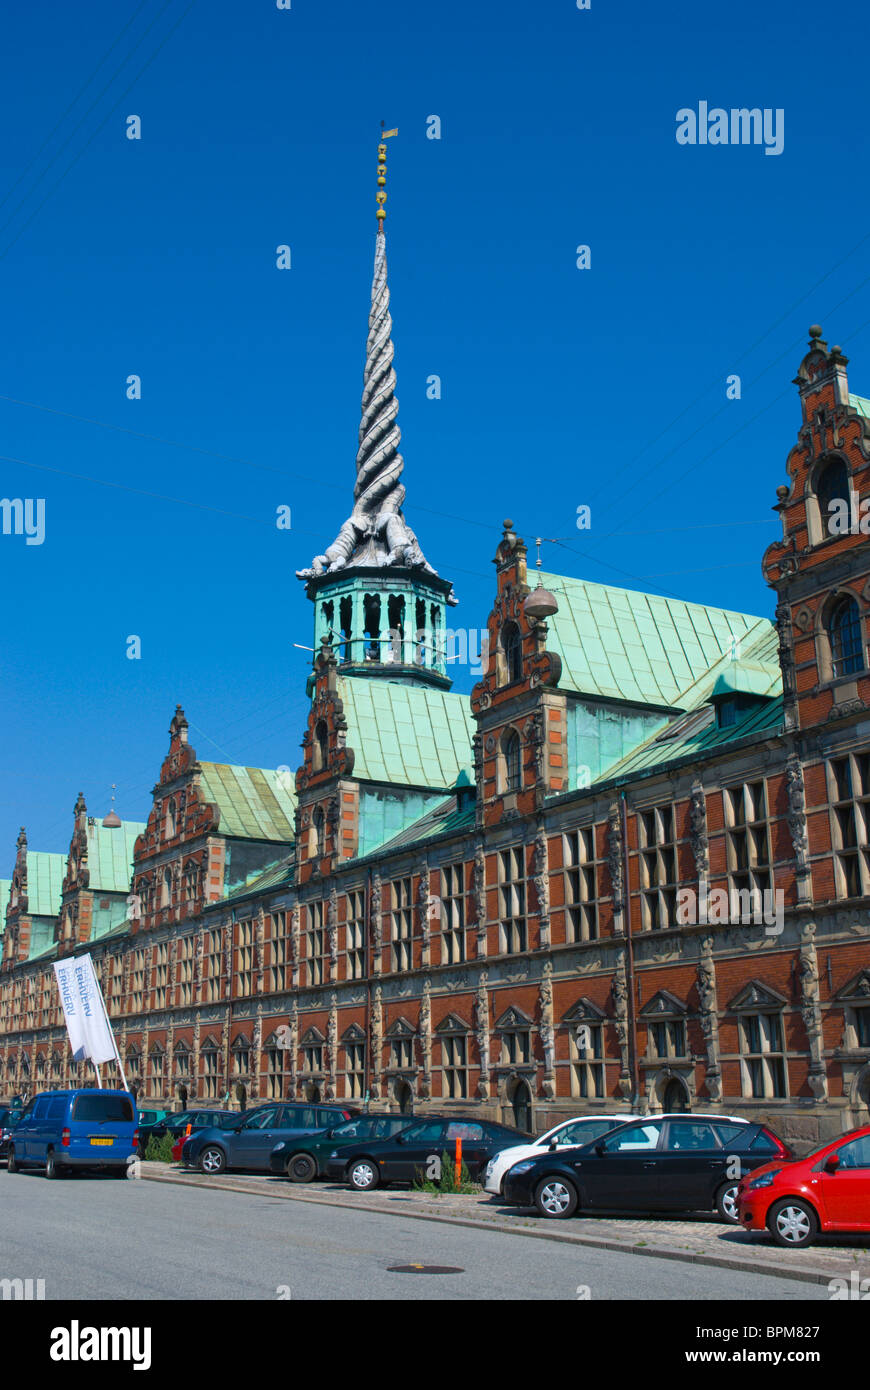 Borsen the stock exchange building on Slotsholmen island central Copenhagen Denmark Europe - Stock Image